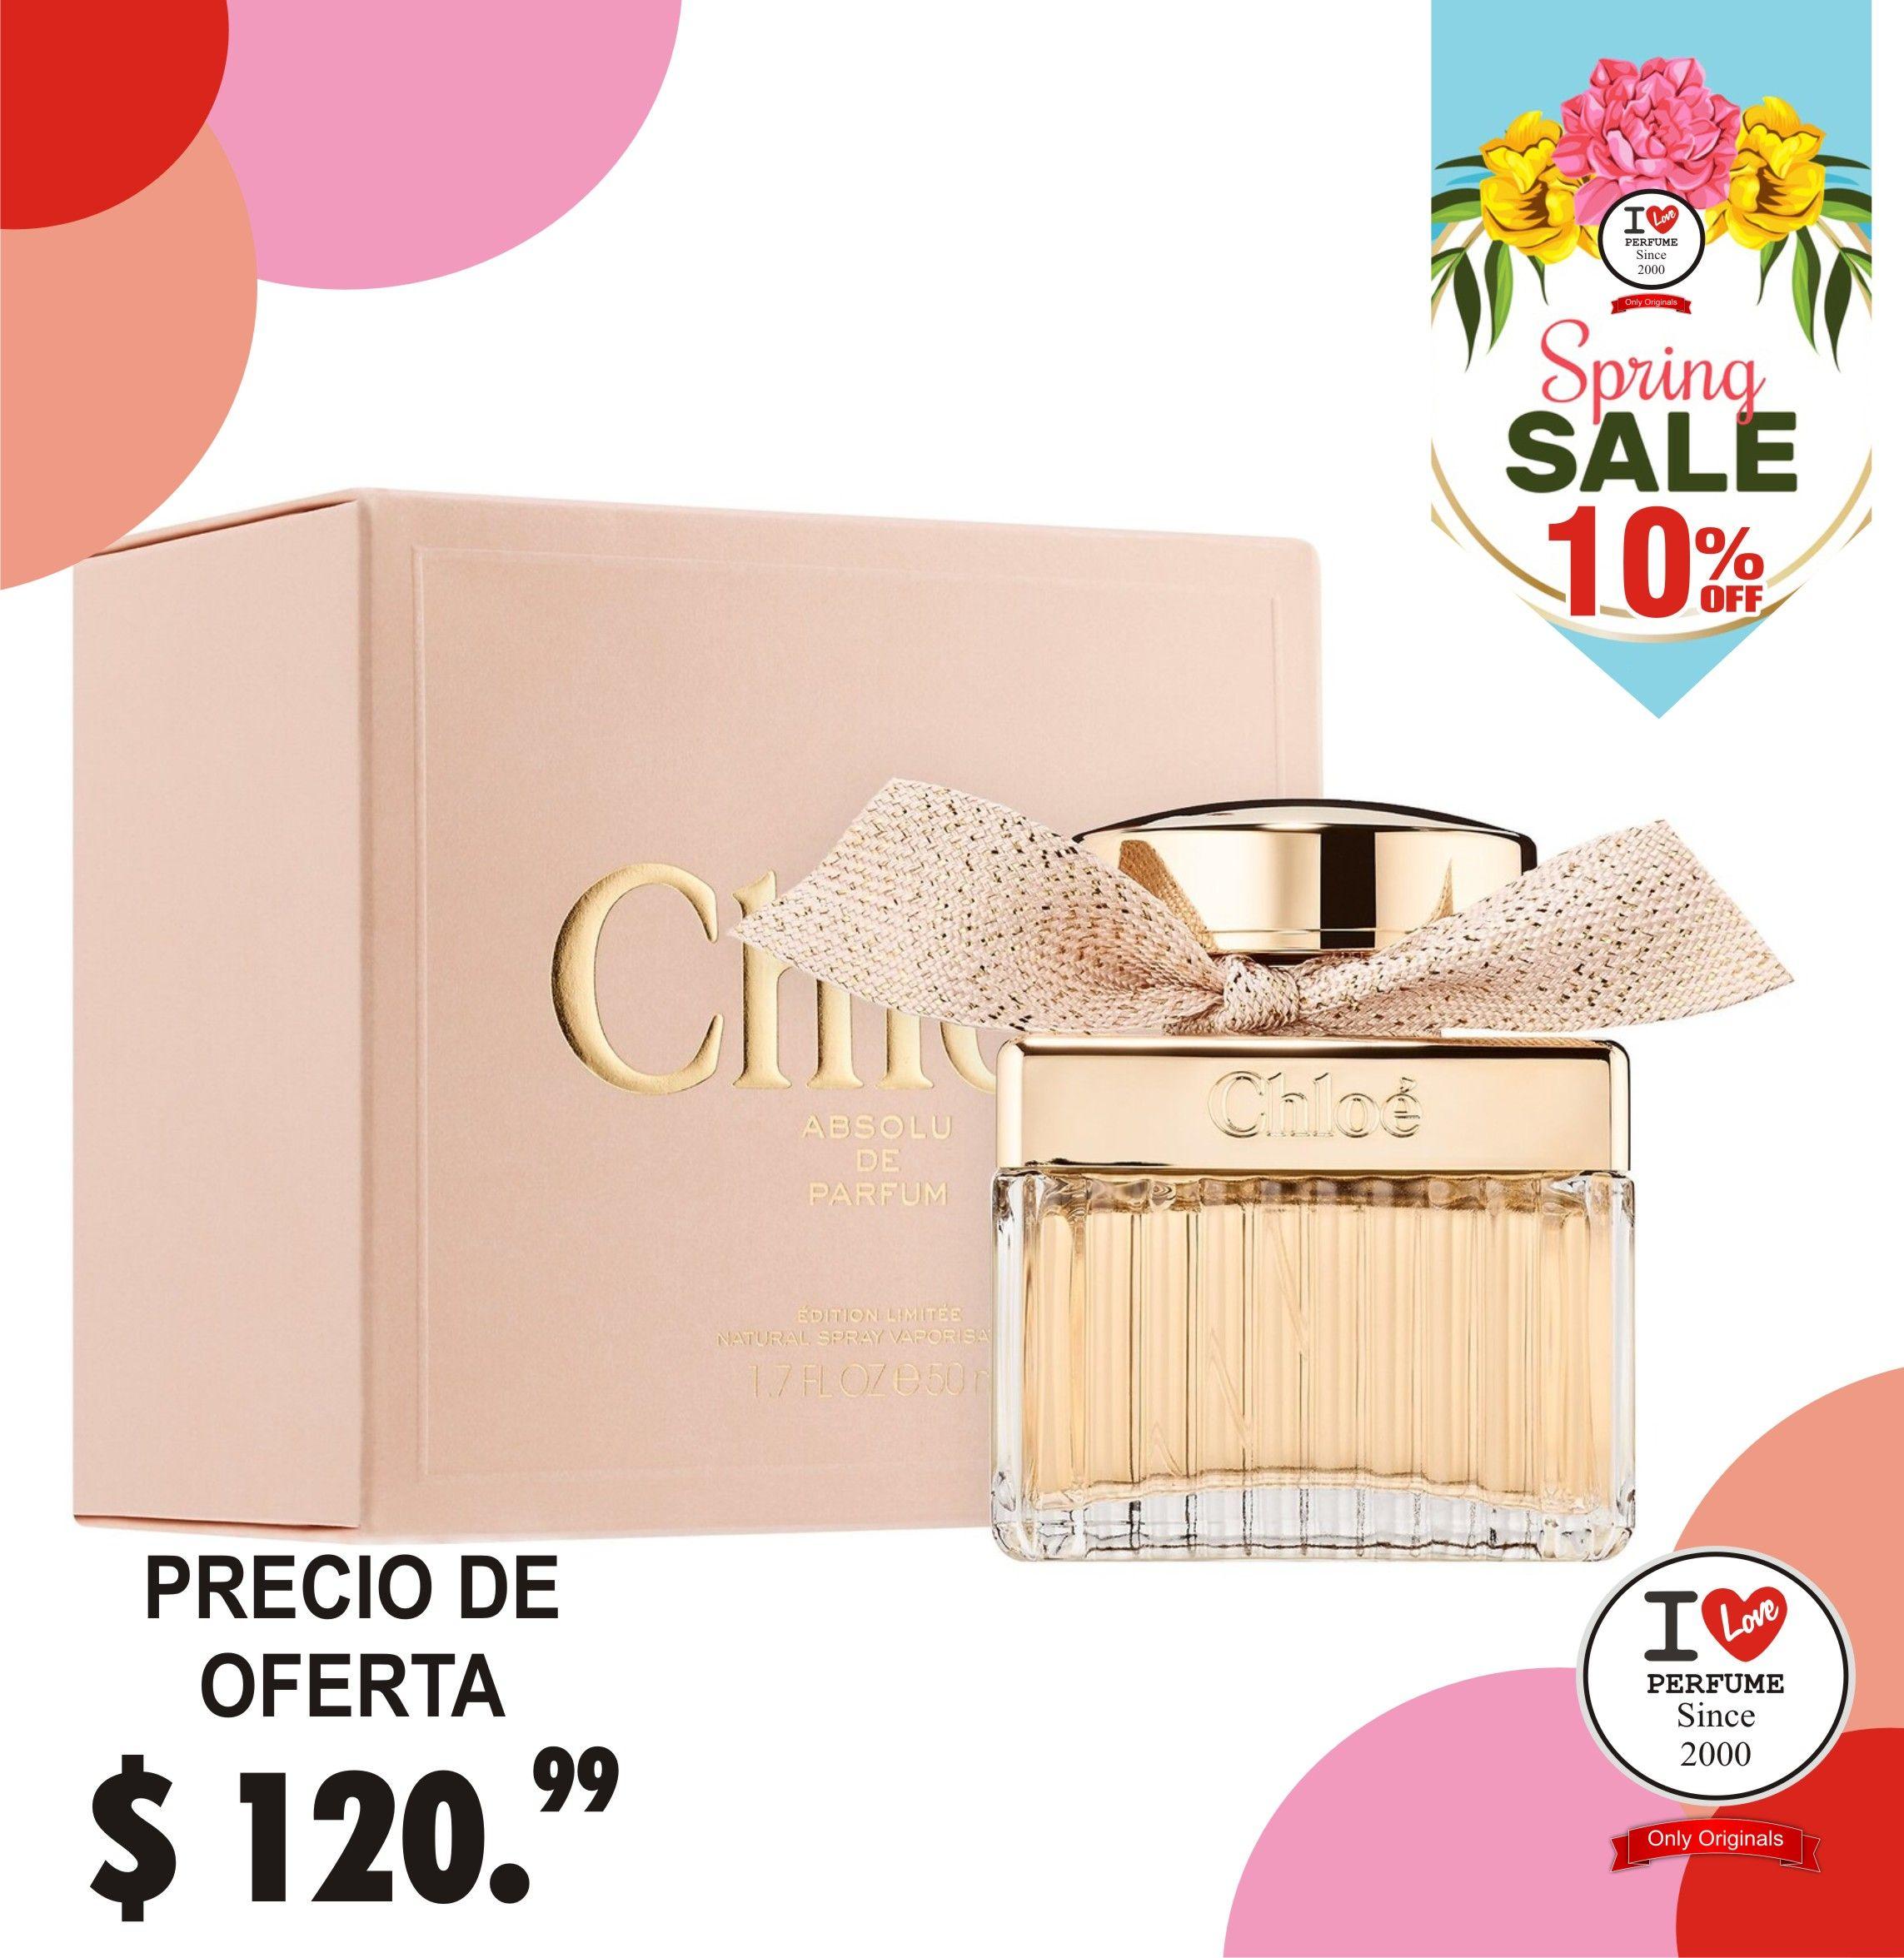 Chloeabsoludeparfum By Chloe Women Eau De Parfum 2 5 Oz Visit Our Business Website And Buy Your Favorite Perfume Https W Perfume Spring Sale Eau De Parfum